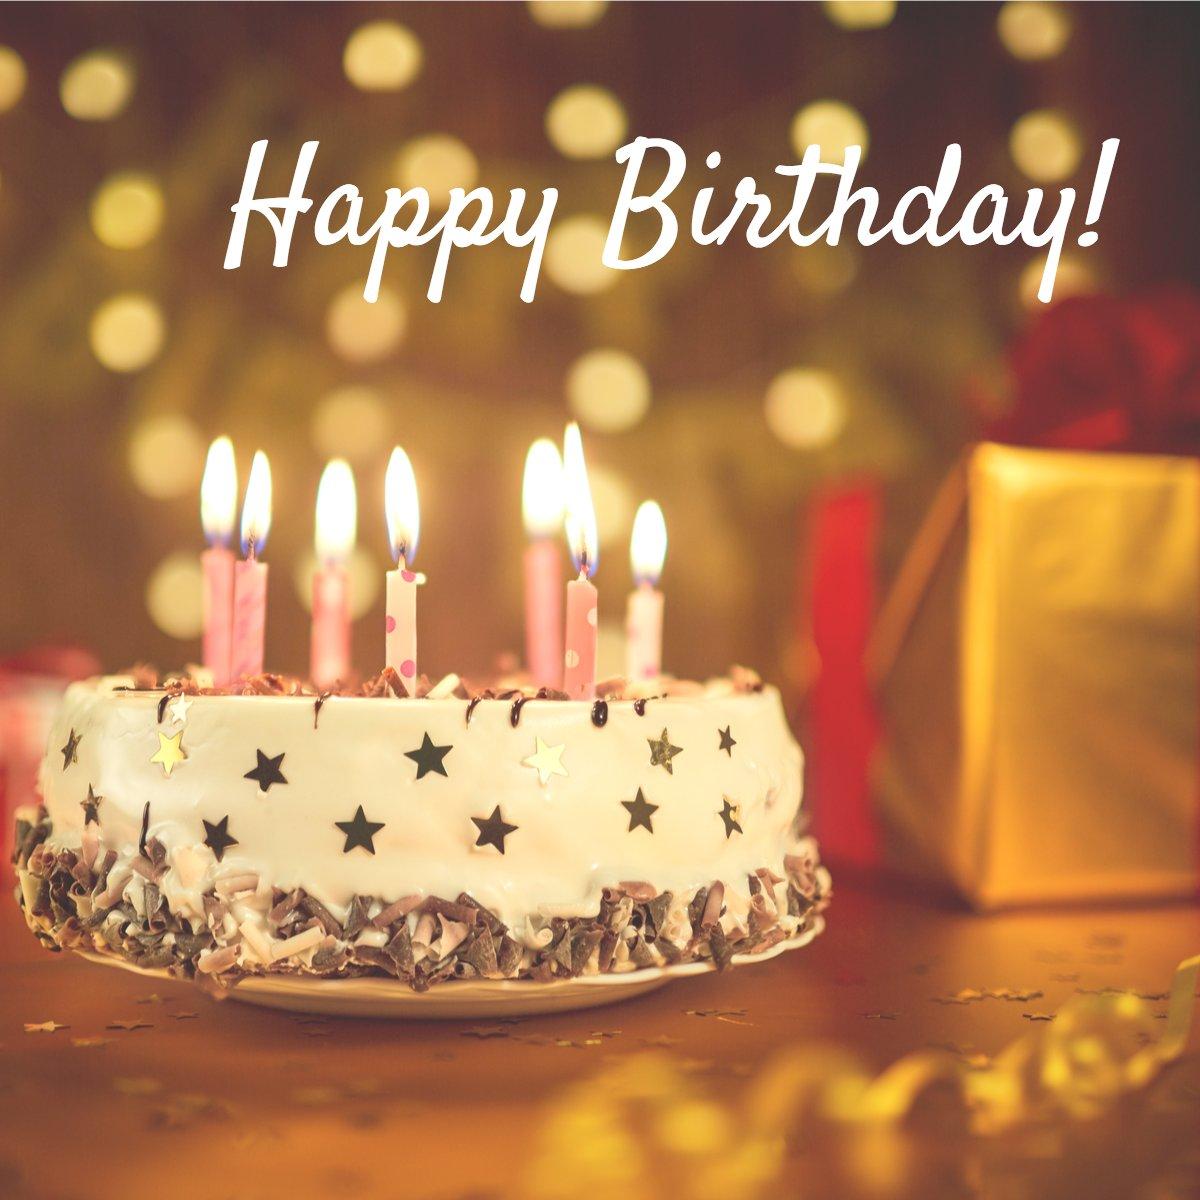 HappyBirthday SeptemberBabies BirthdayFun Cake VirgoSeason LibraSeasonpictwitter LbAIizyJGo